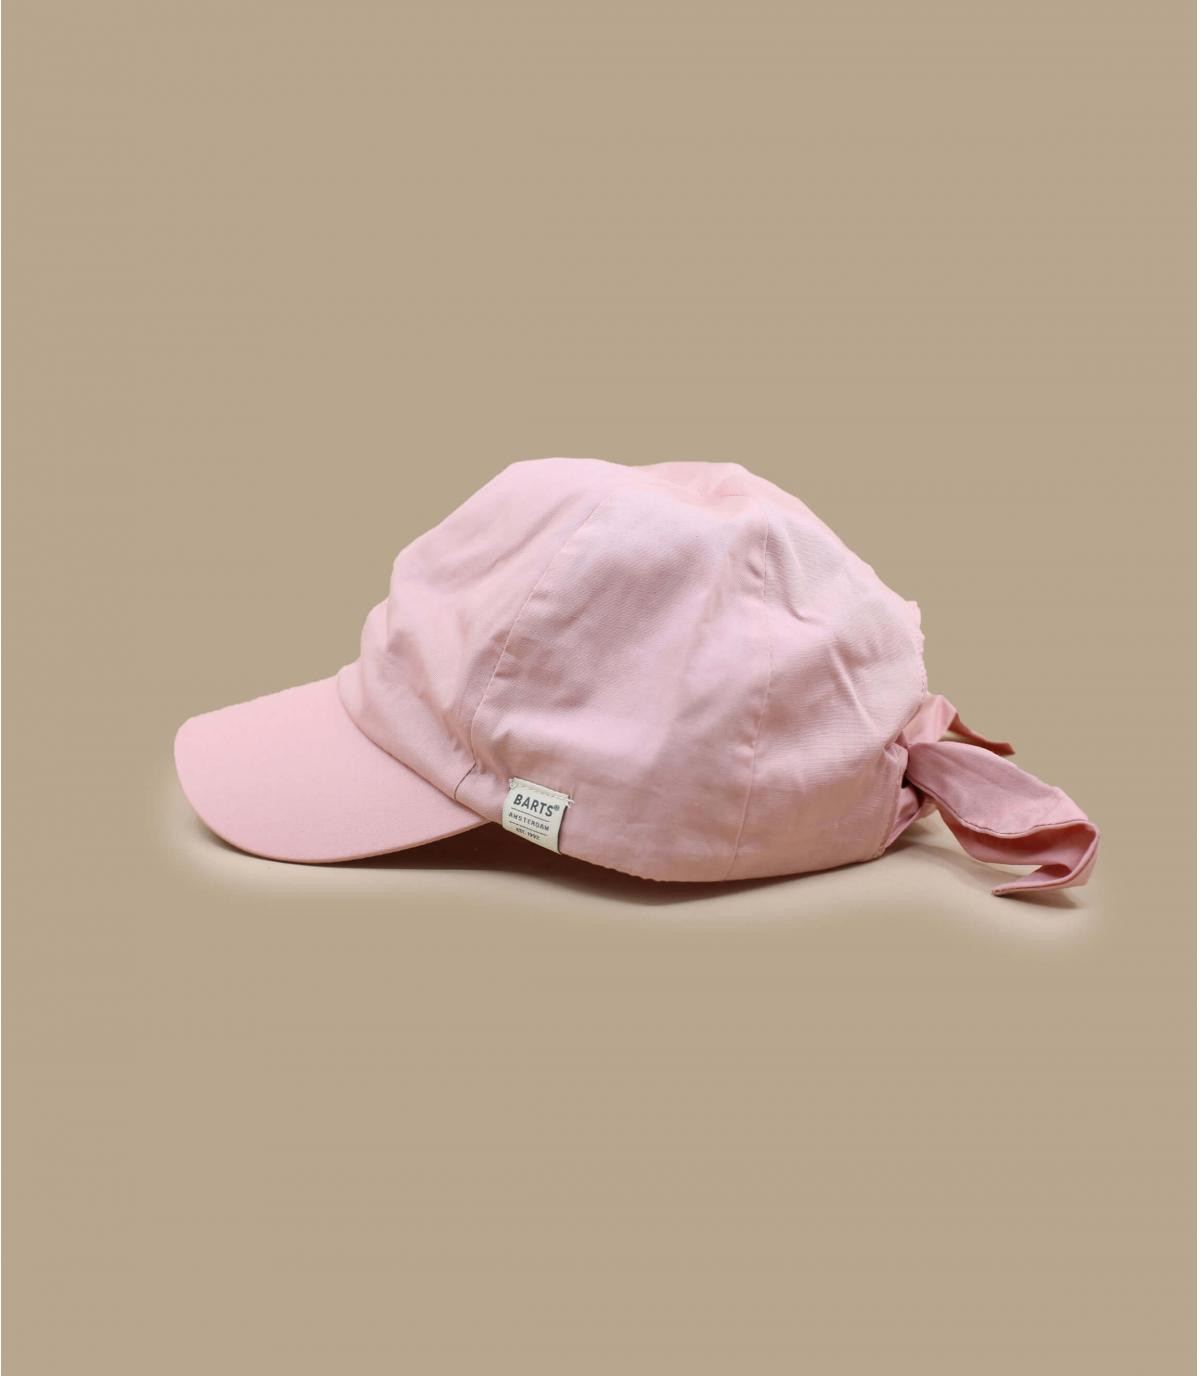 Detalles Wupper dusty pink imagen 2